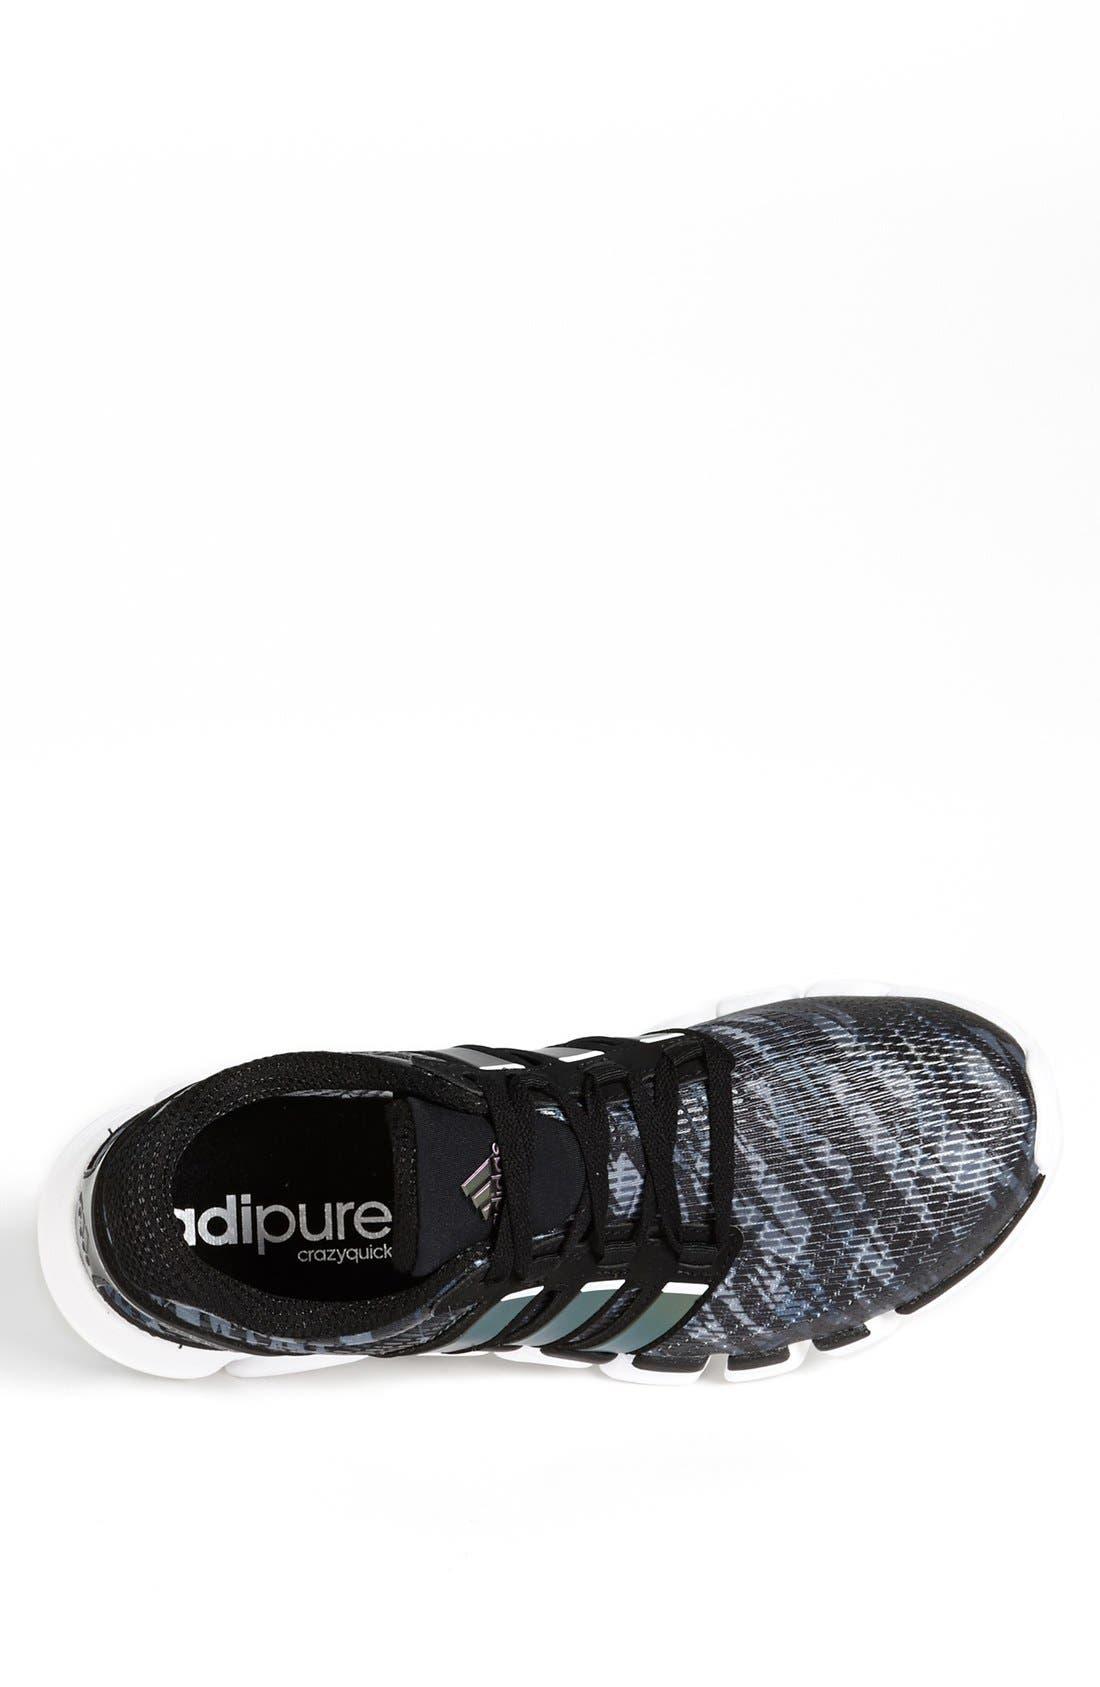 Alternate Image 3  - adidas 'adiPure CrazyQuick' Running Shoe (Men)